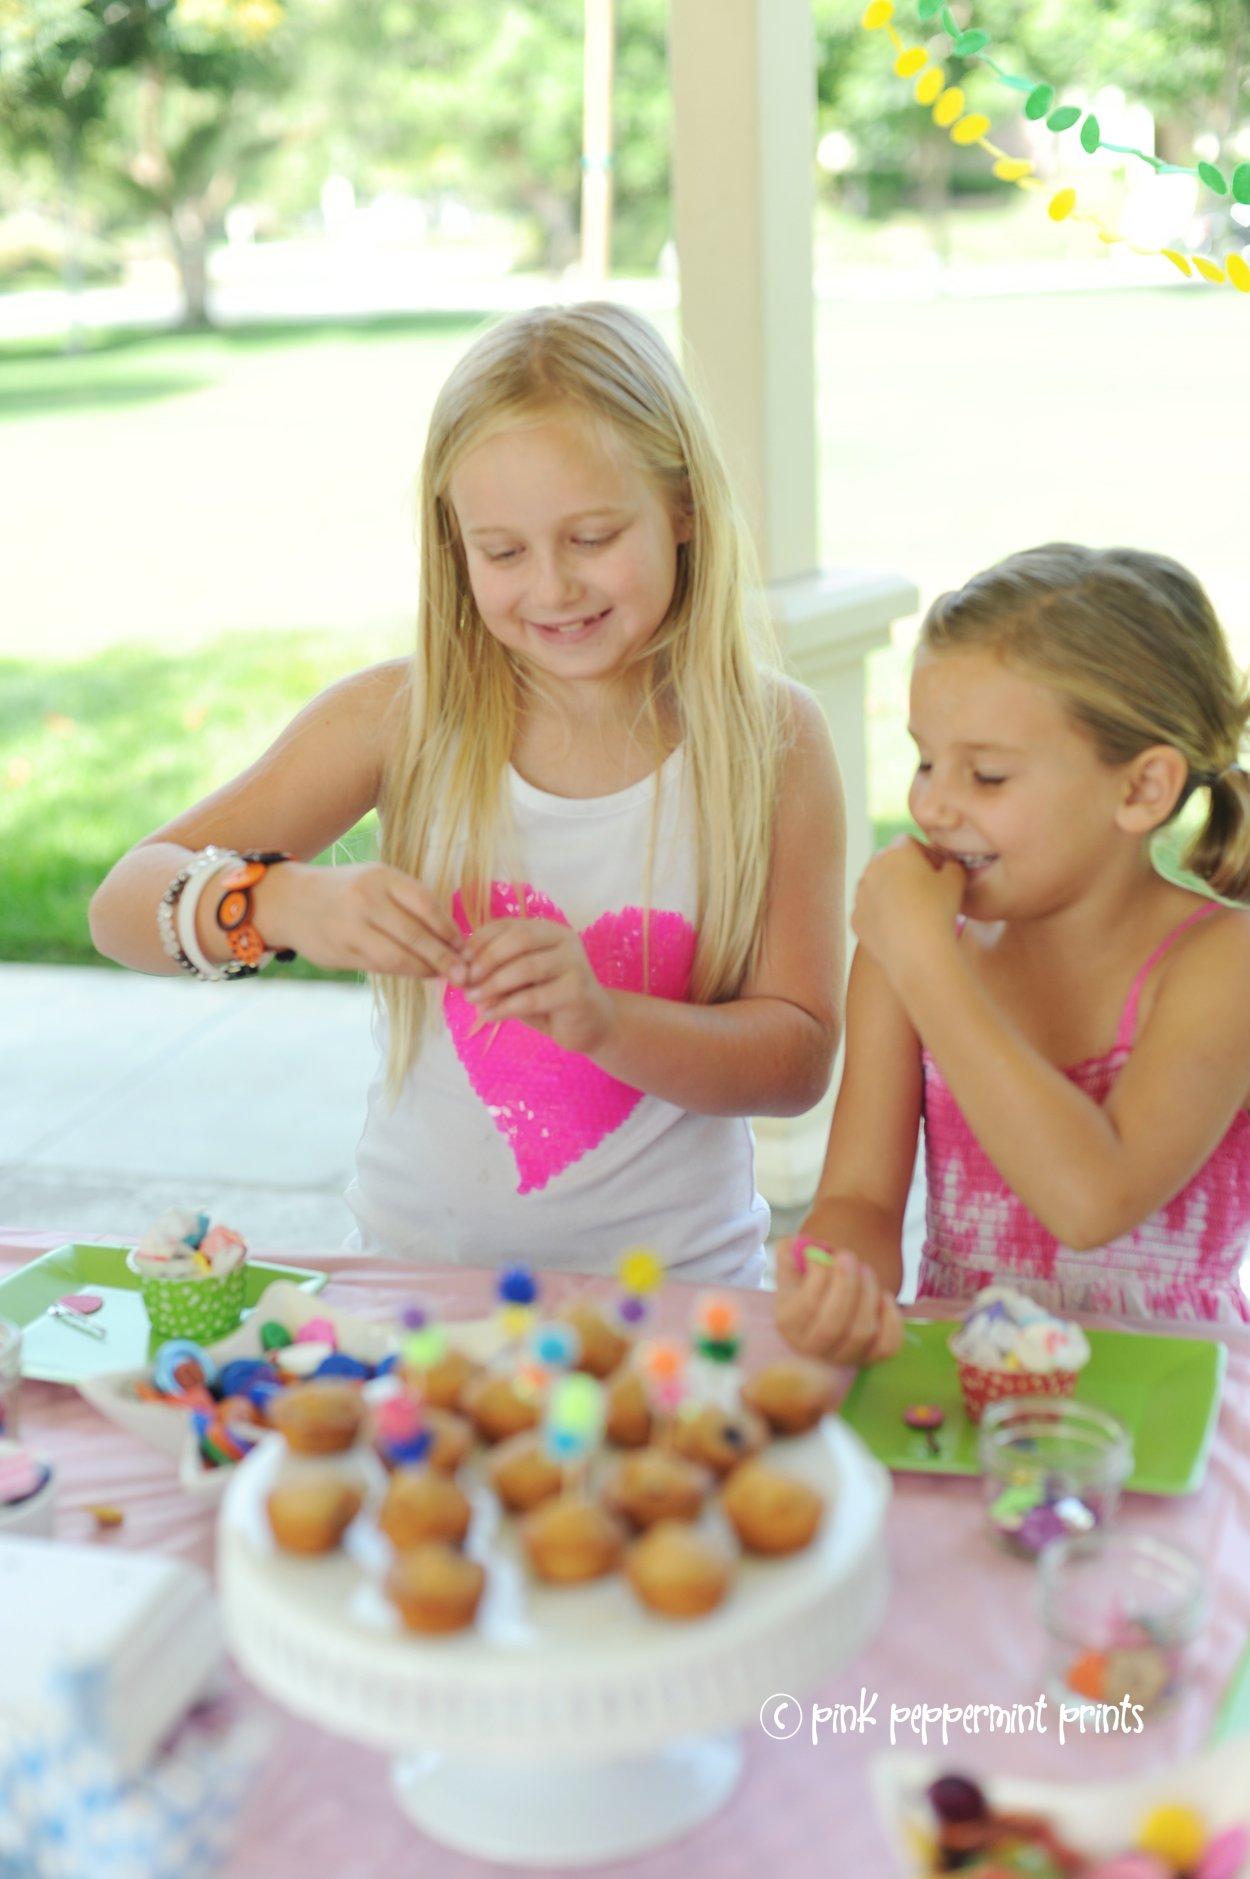 Art camp art party craft birthday party cute party ideas diy tutorials party food ideas